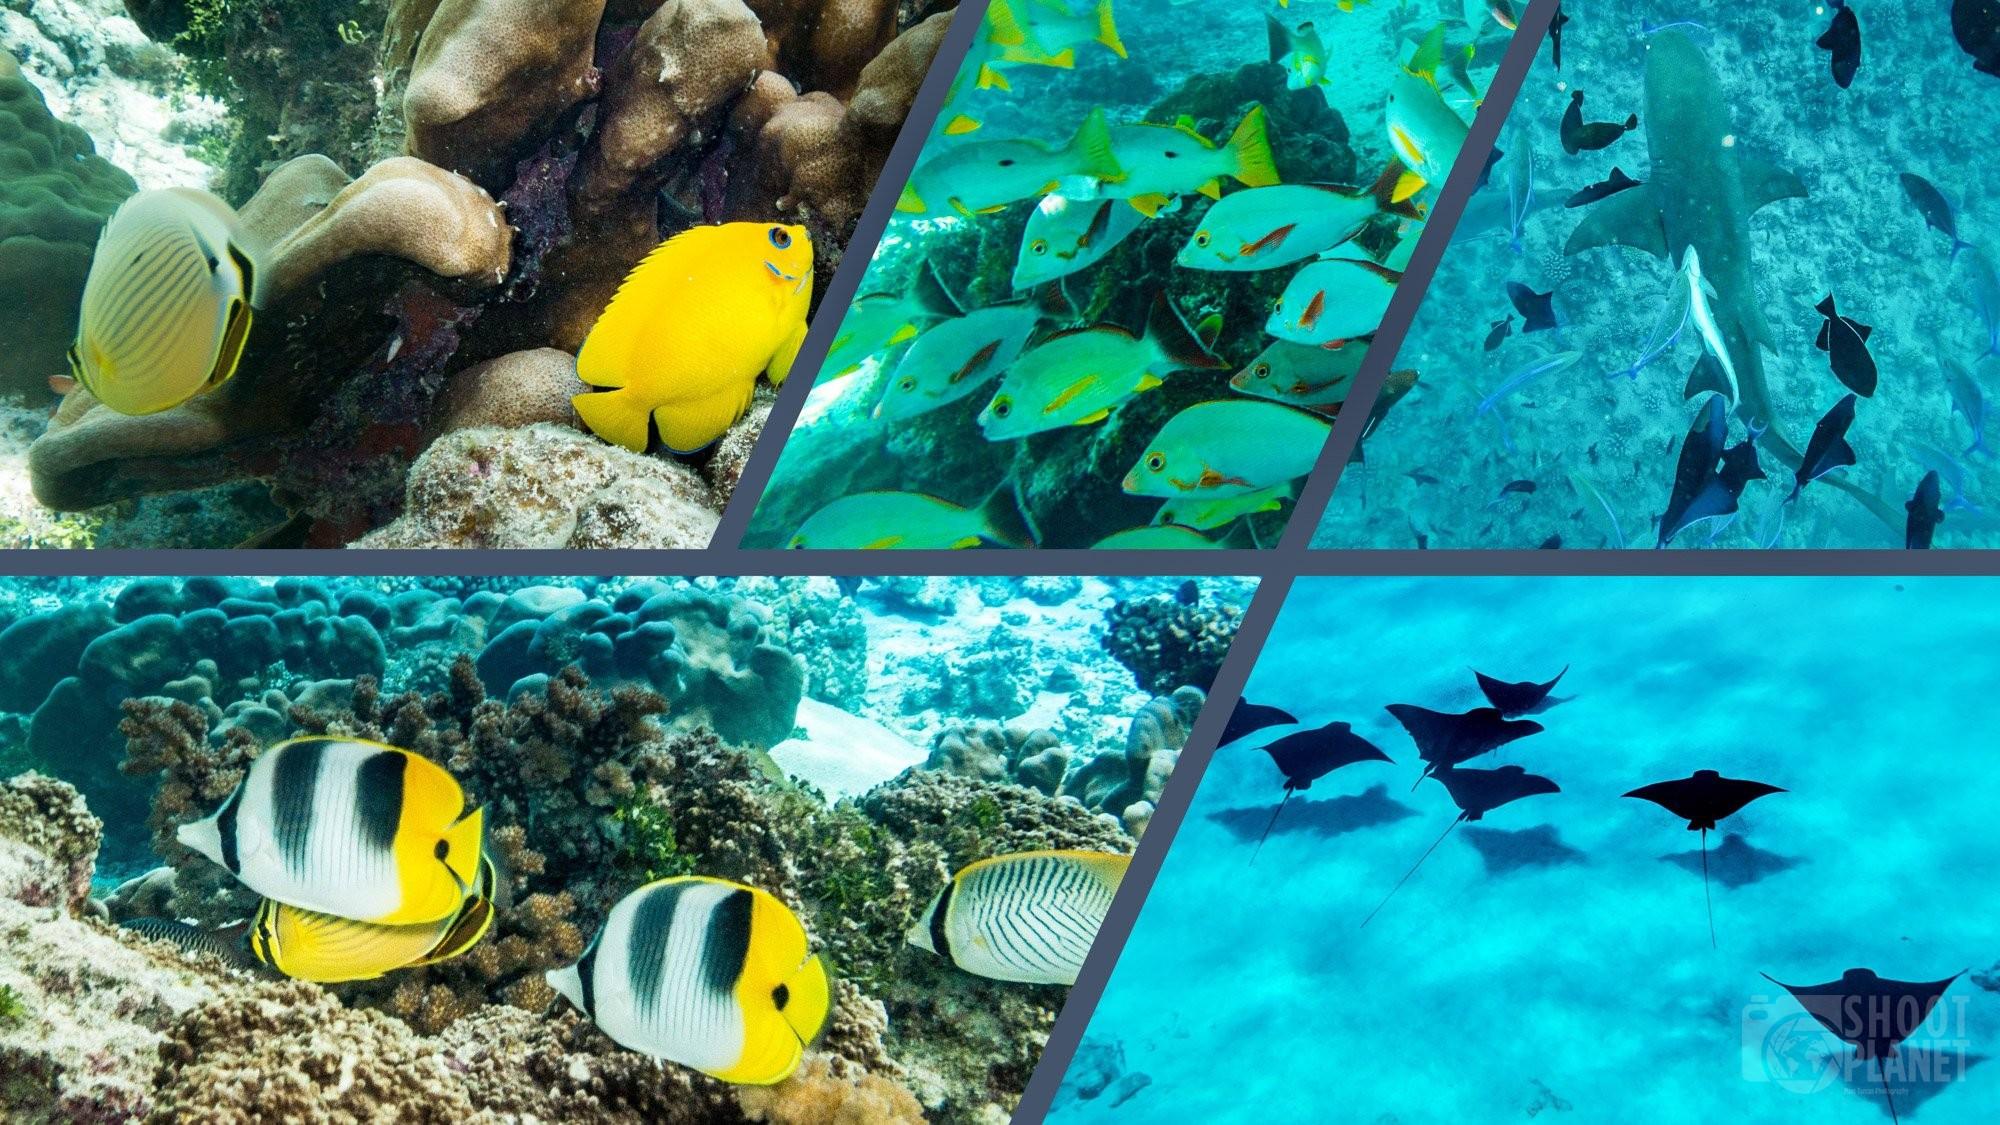 Underwater wildlife of Tuamotus collage in Polynesia